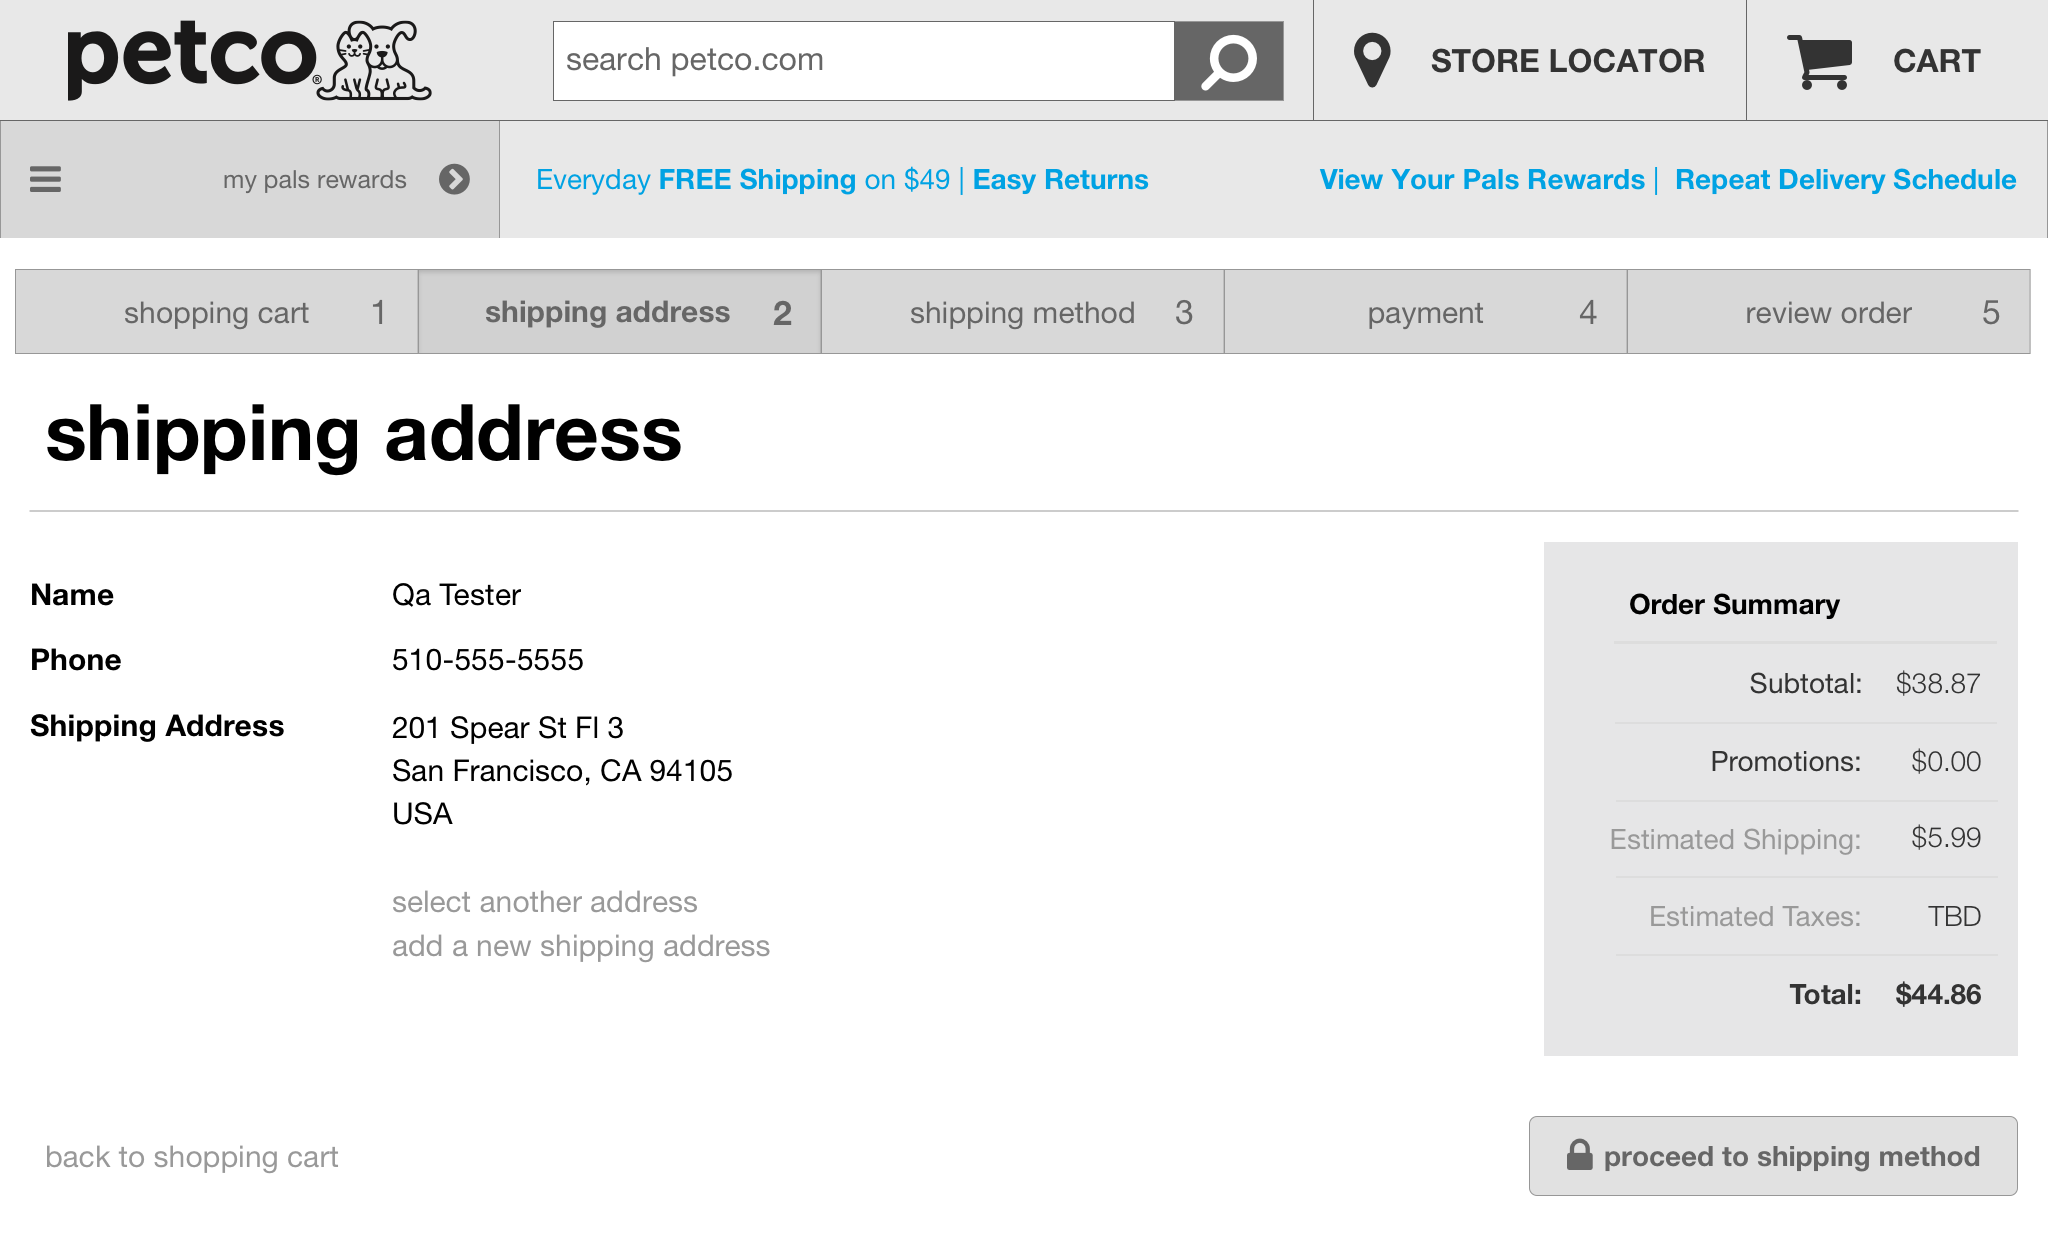 Cart - Shipping Address